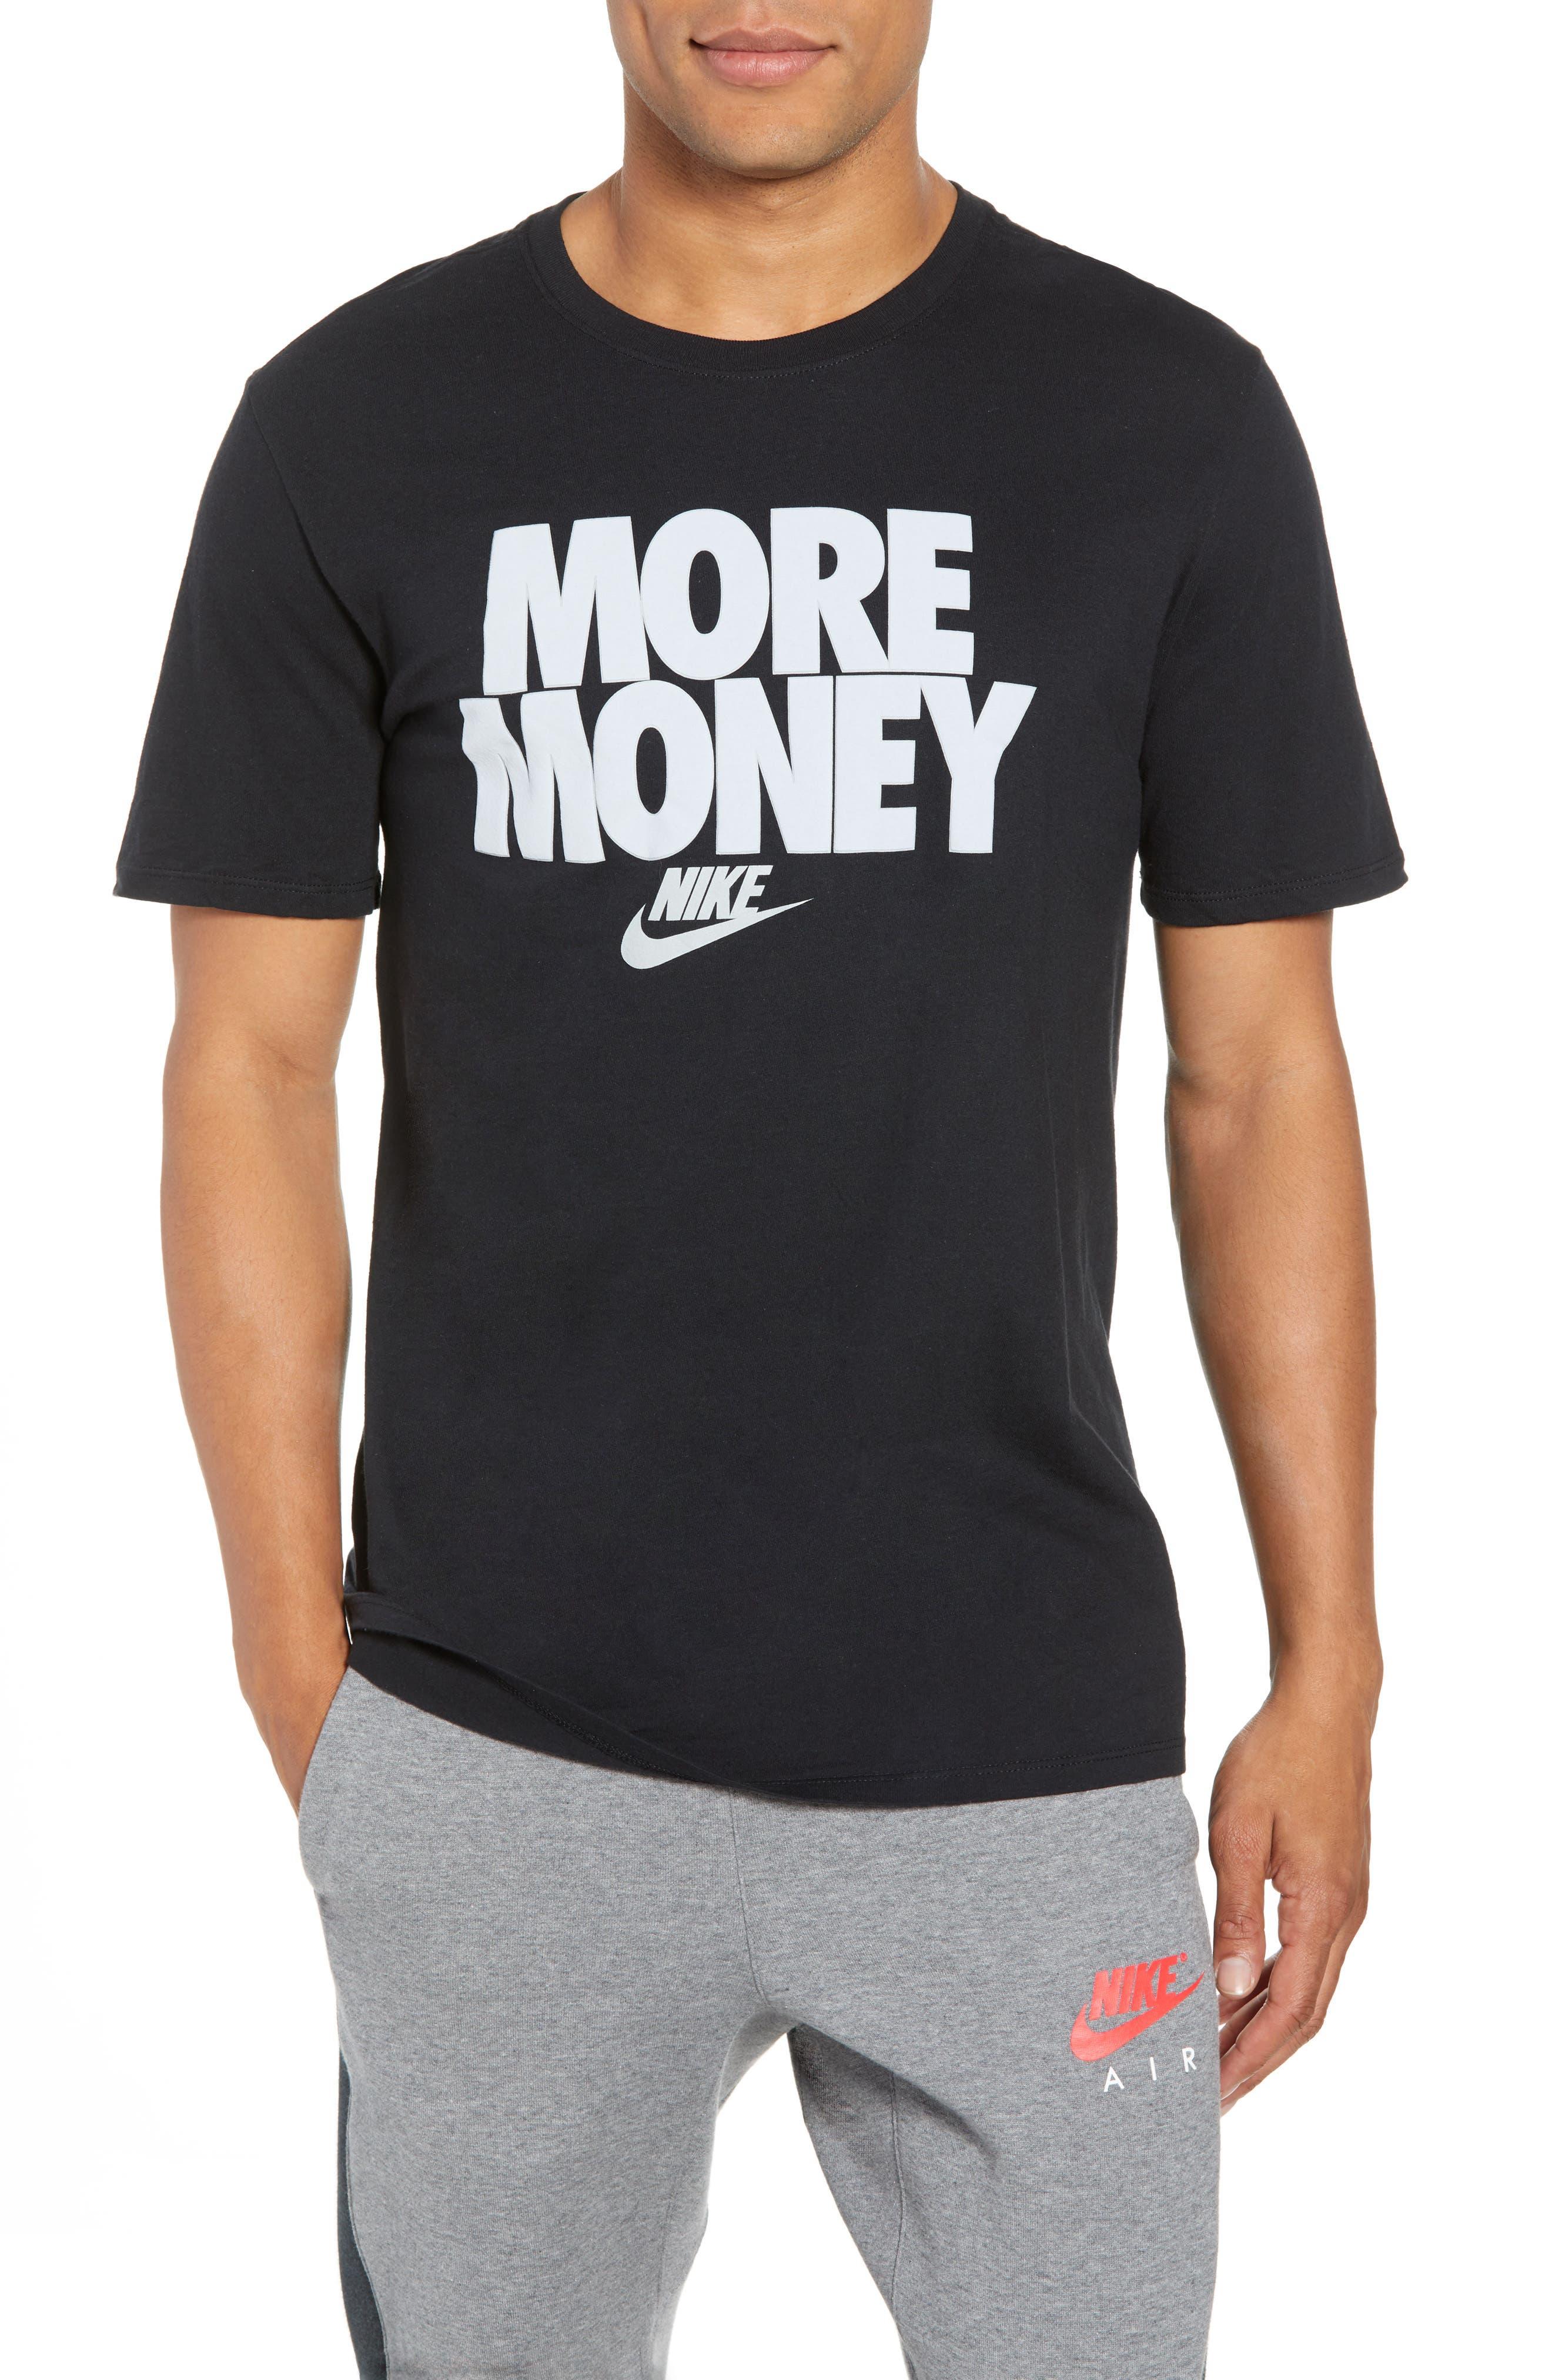 NIKE,                             Sportswear More Money T-Shirt,                             Main thumbnail 1, color,                             010